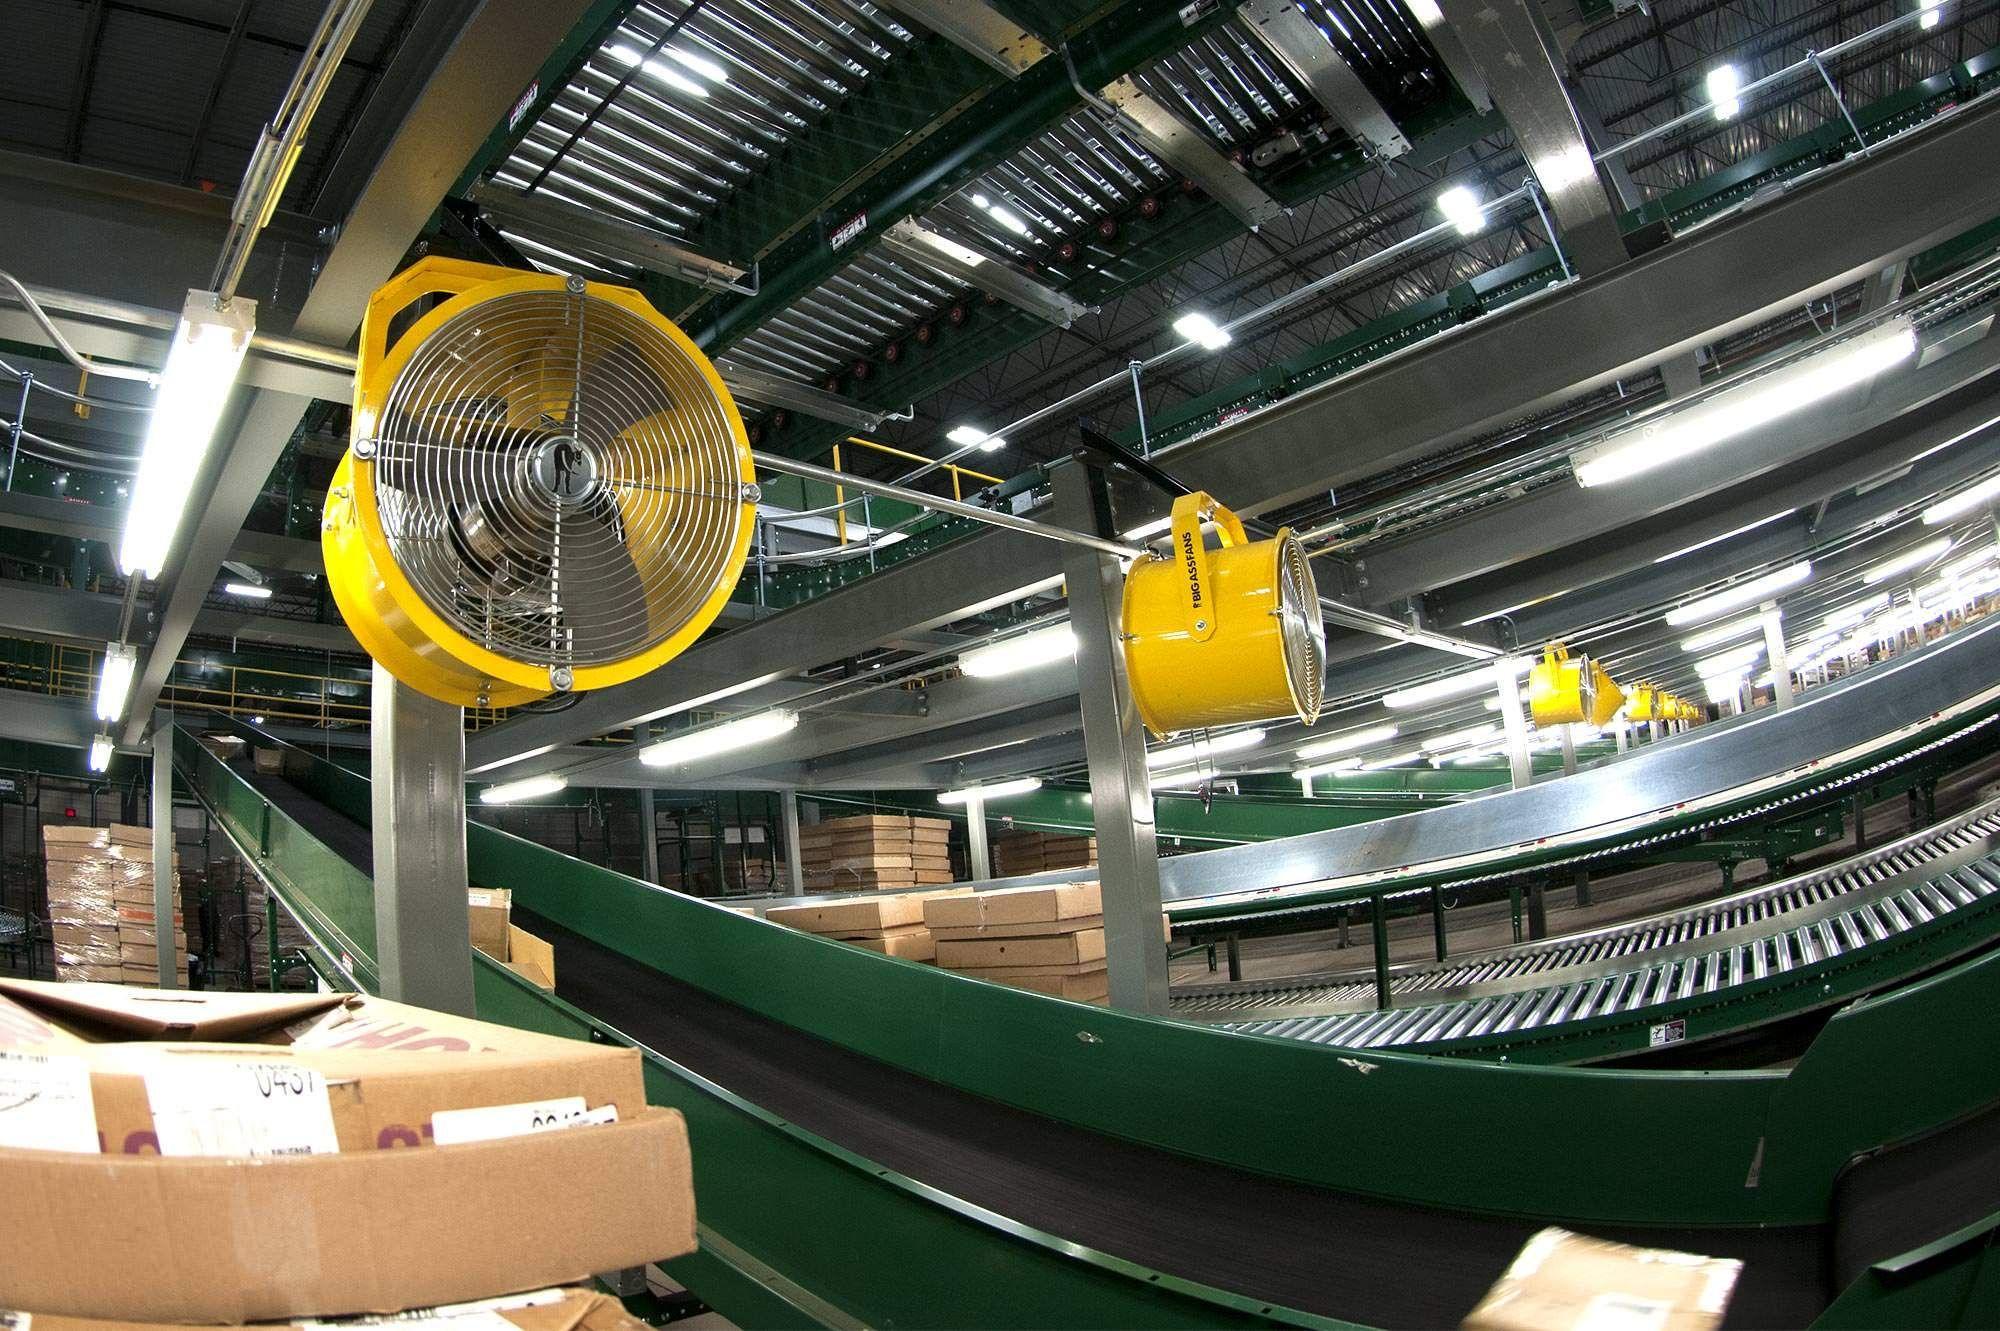 Pivoting Wall Fans Fix Kohl S Distribution Center Airflow Big Ass